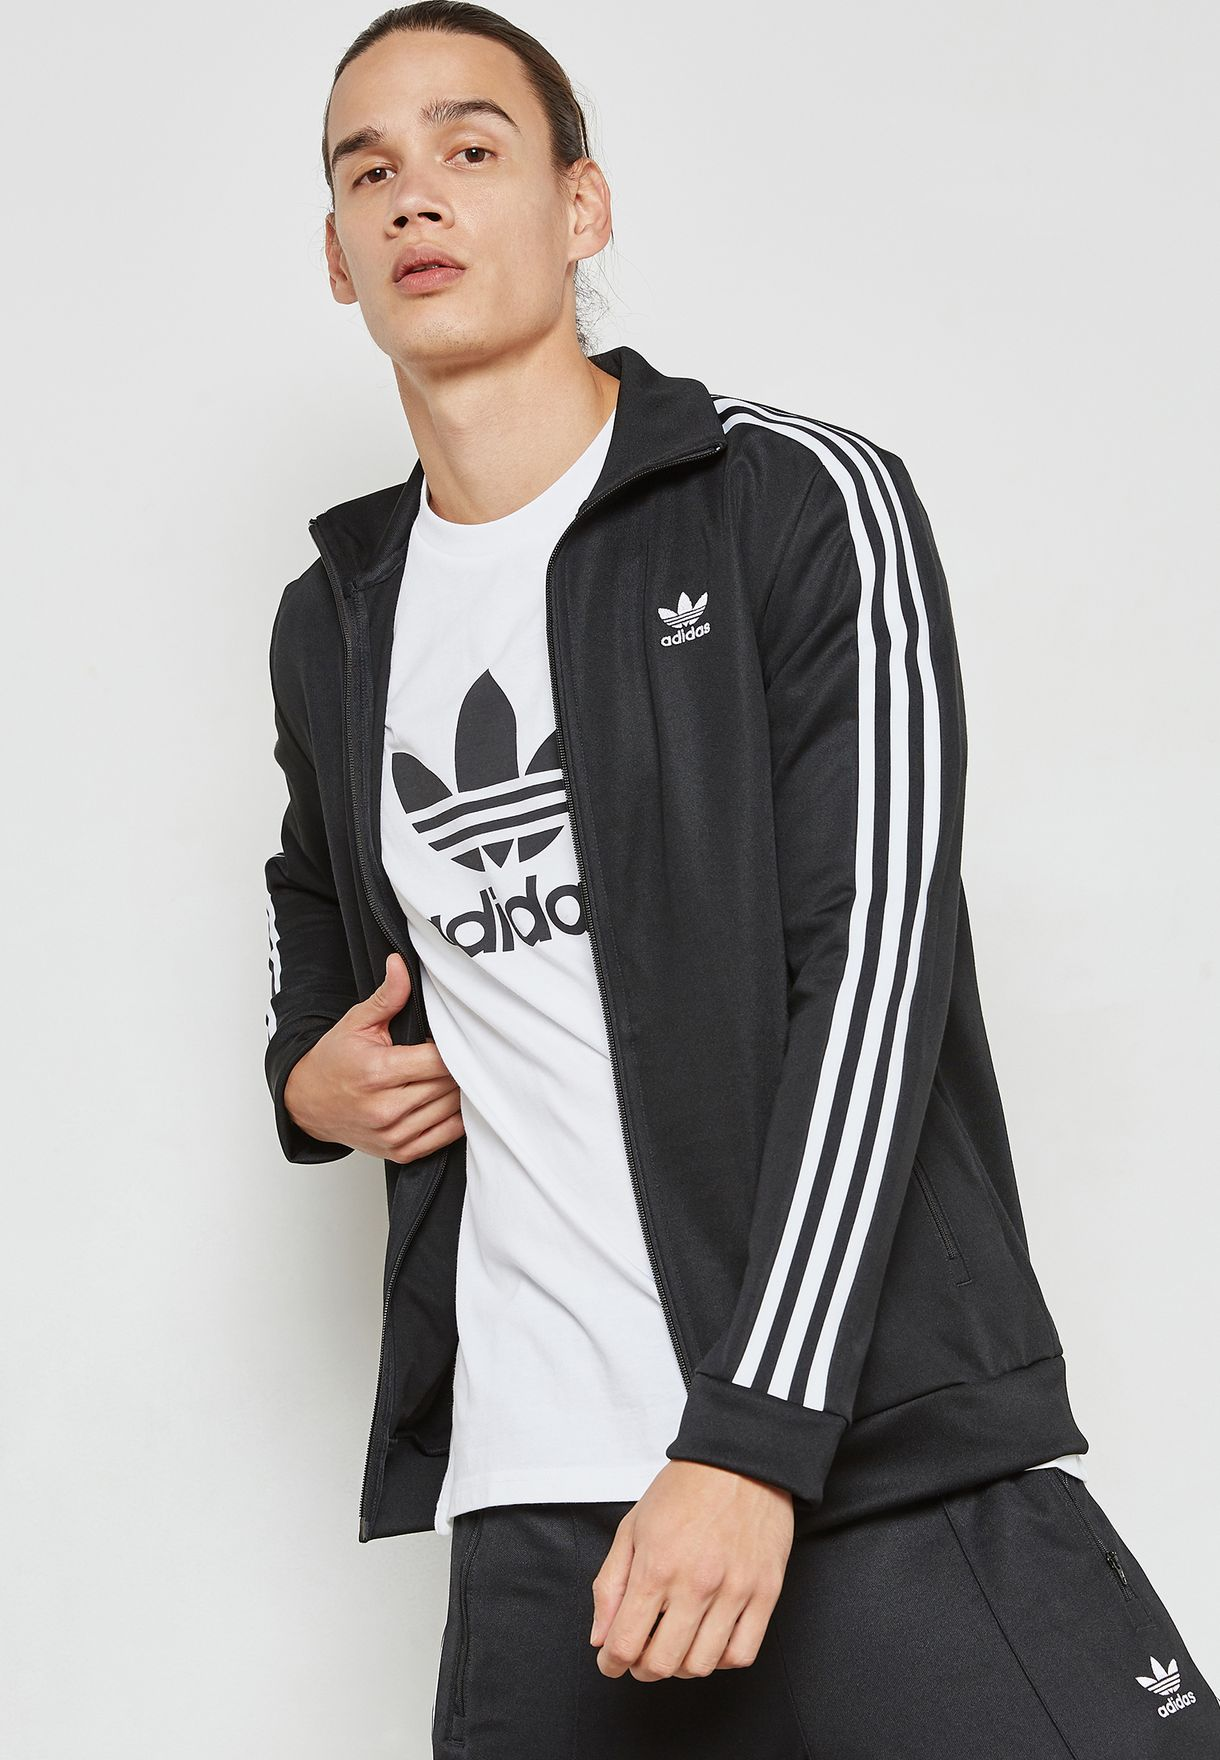 e24548daa1 Shop adidas Originals black adicolor Beckenbauer Track Jacket CW1250 ...